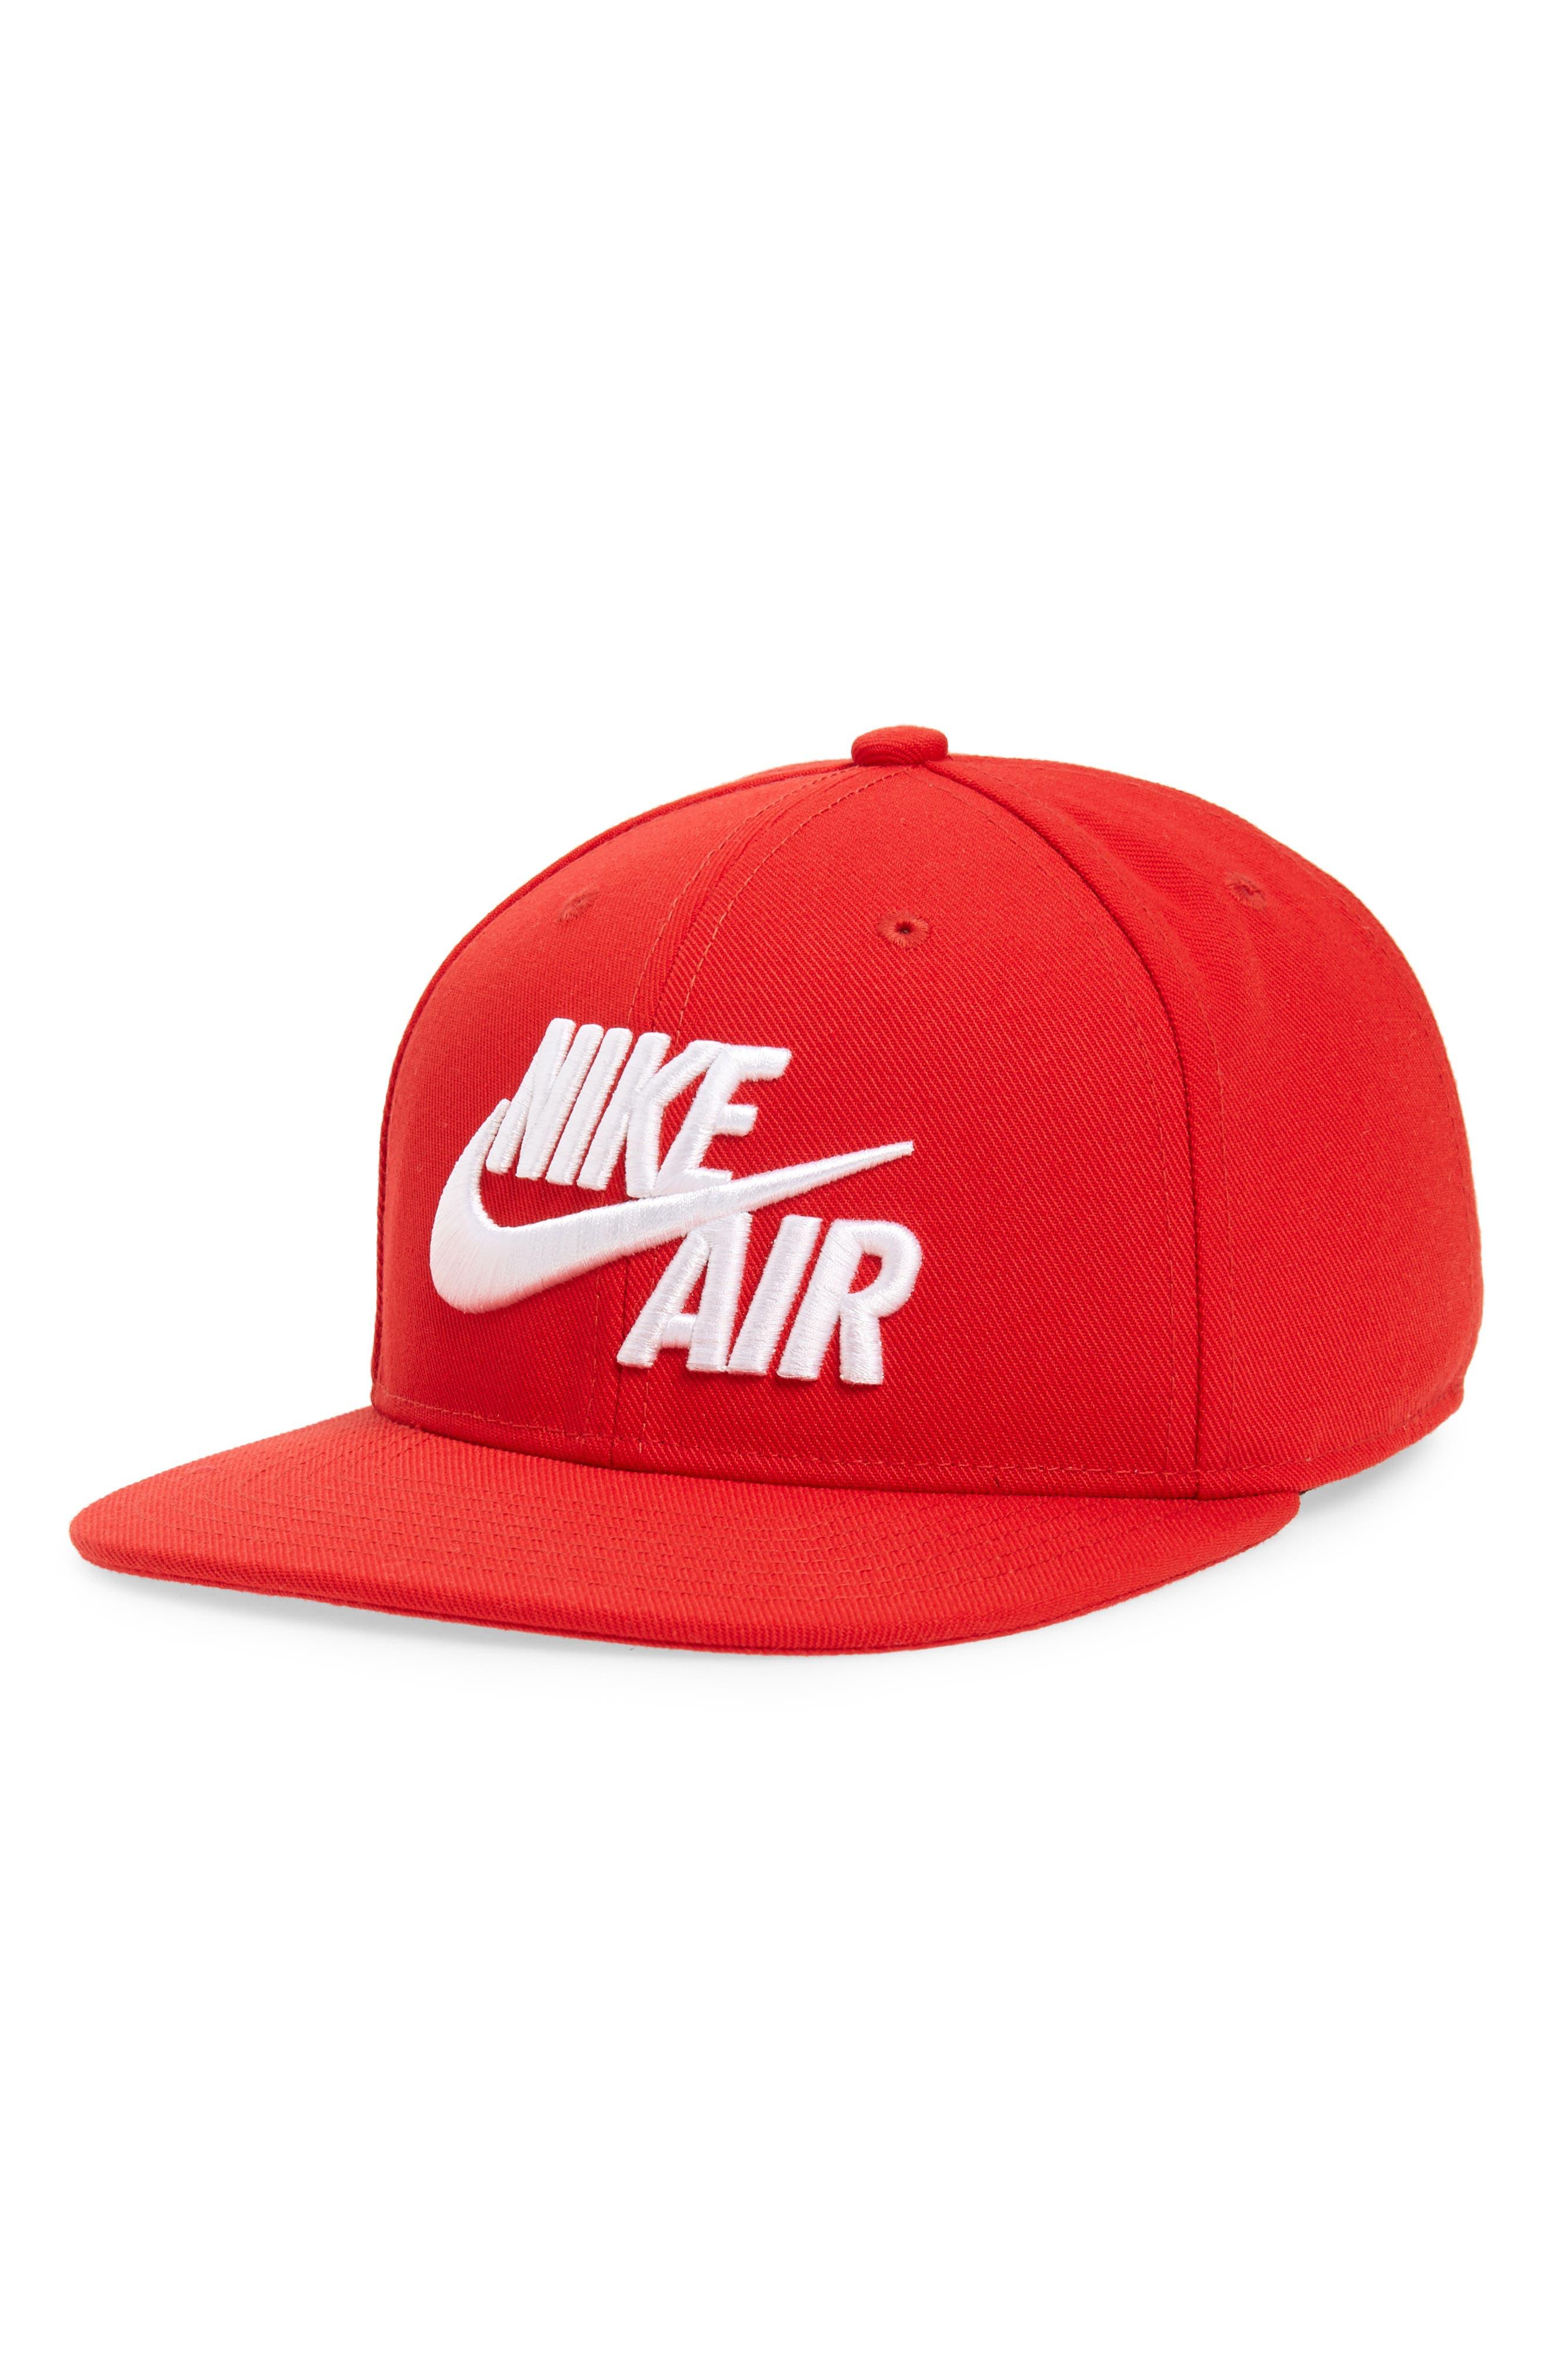 NIKE Air Pro Snapback Baseball Cap, Main, color, UNIVERSITY RED